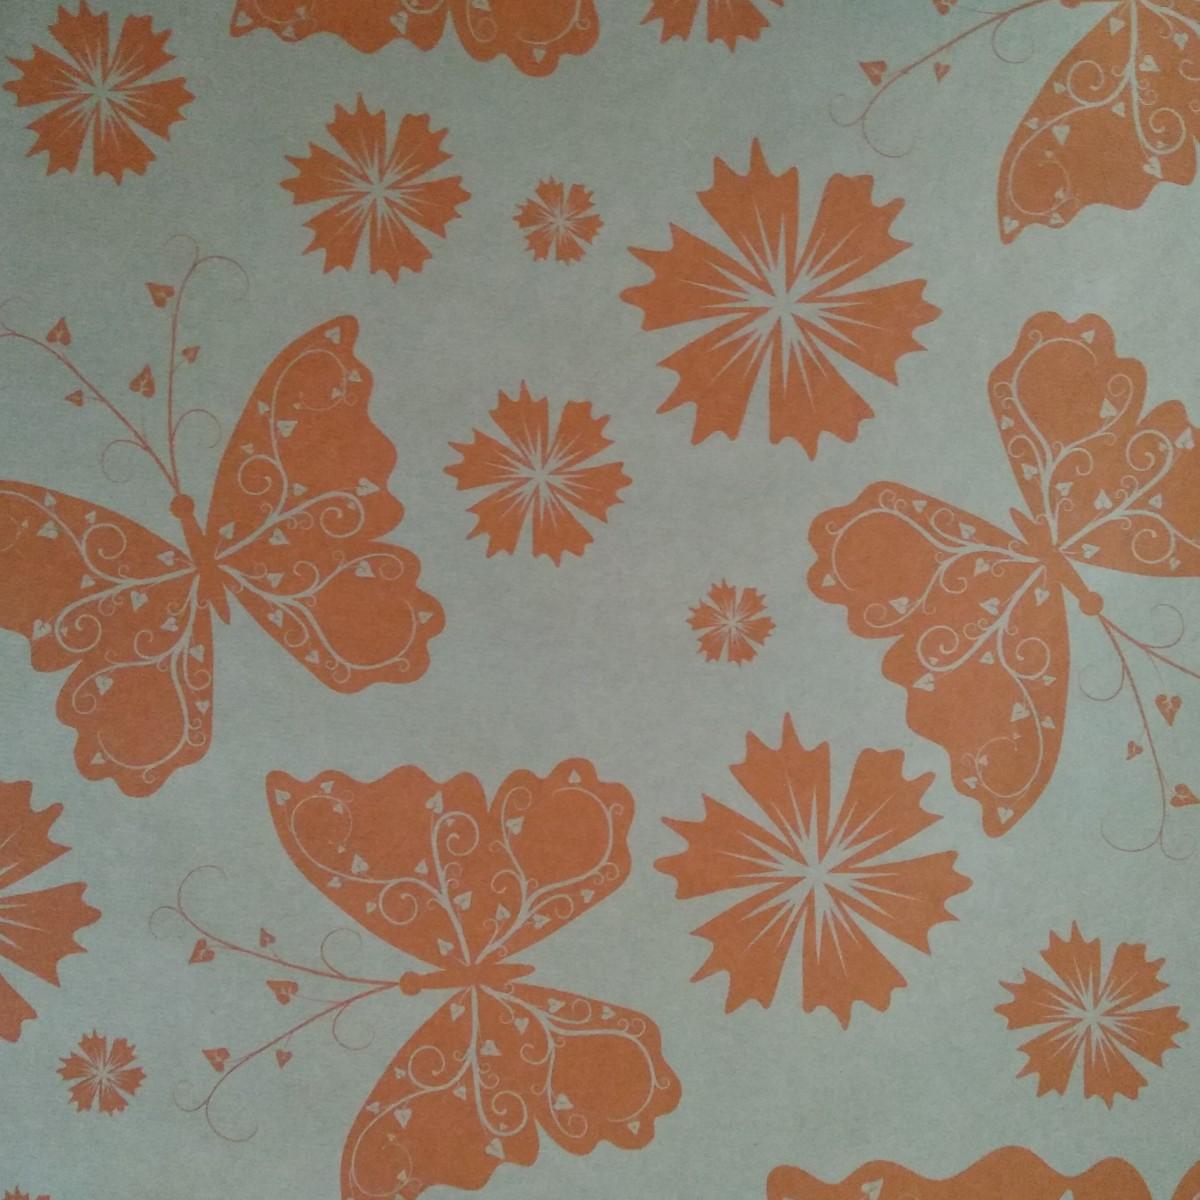 7209 Butterflies Print Orange 50cmx25m Kraft Paper - 1 Roll